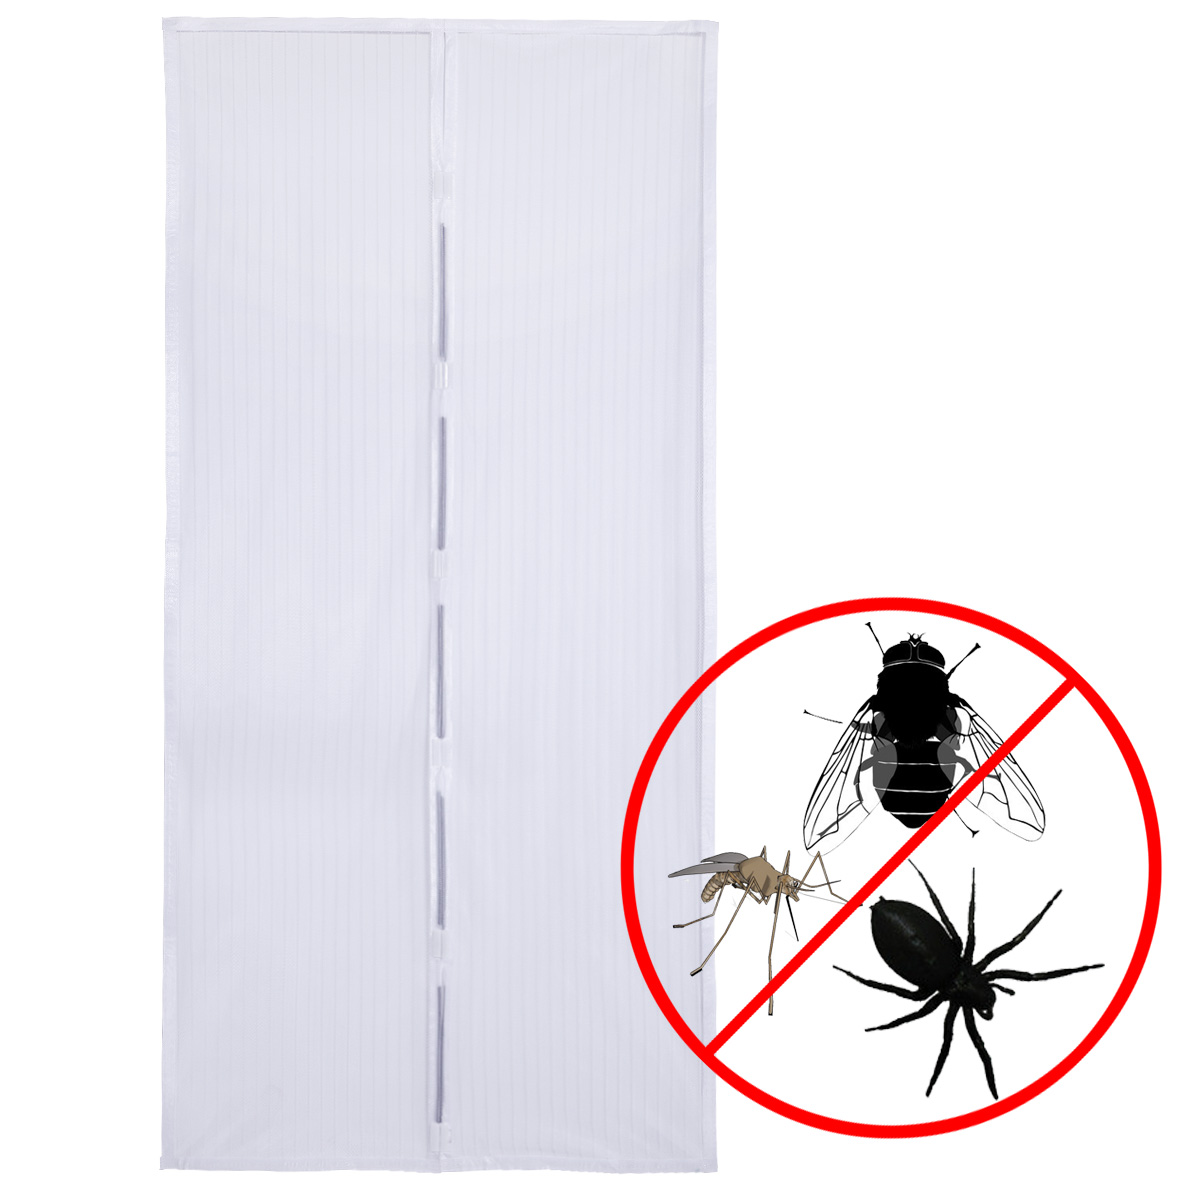 weiss moskitonetz fliegengitter gitter magnete moskito vorhang t r 210cm ebay. Black Bedroom Furniture Sets. Home Design Ideas